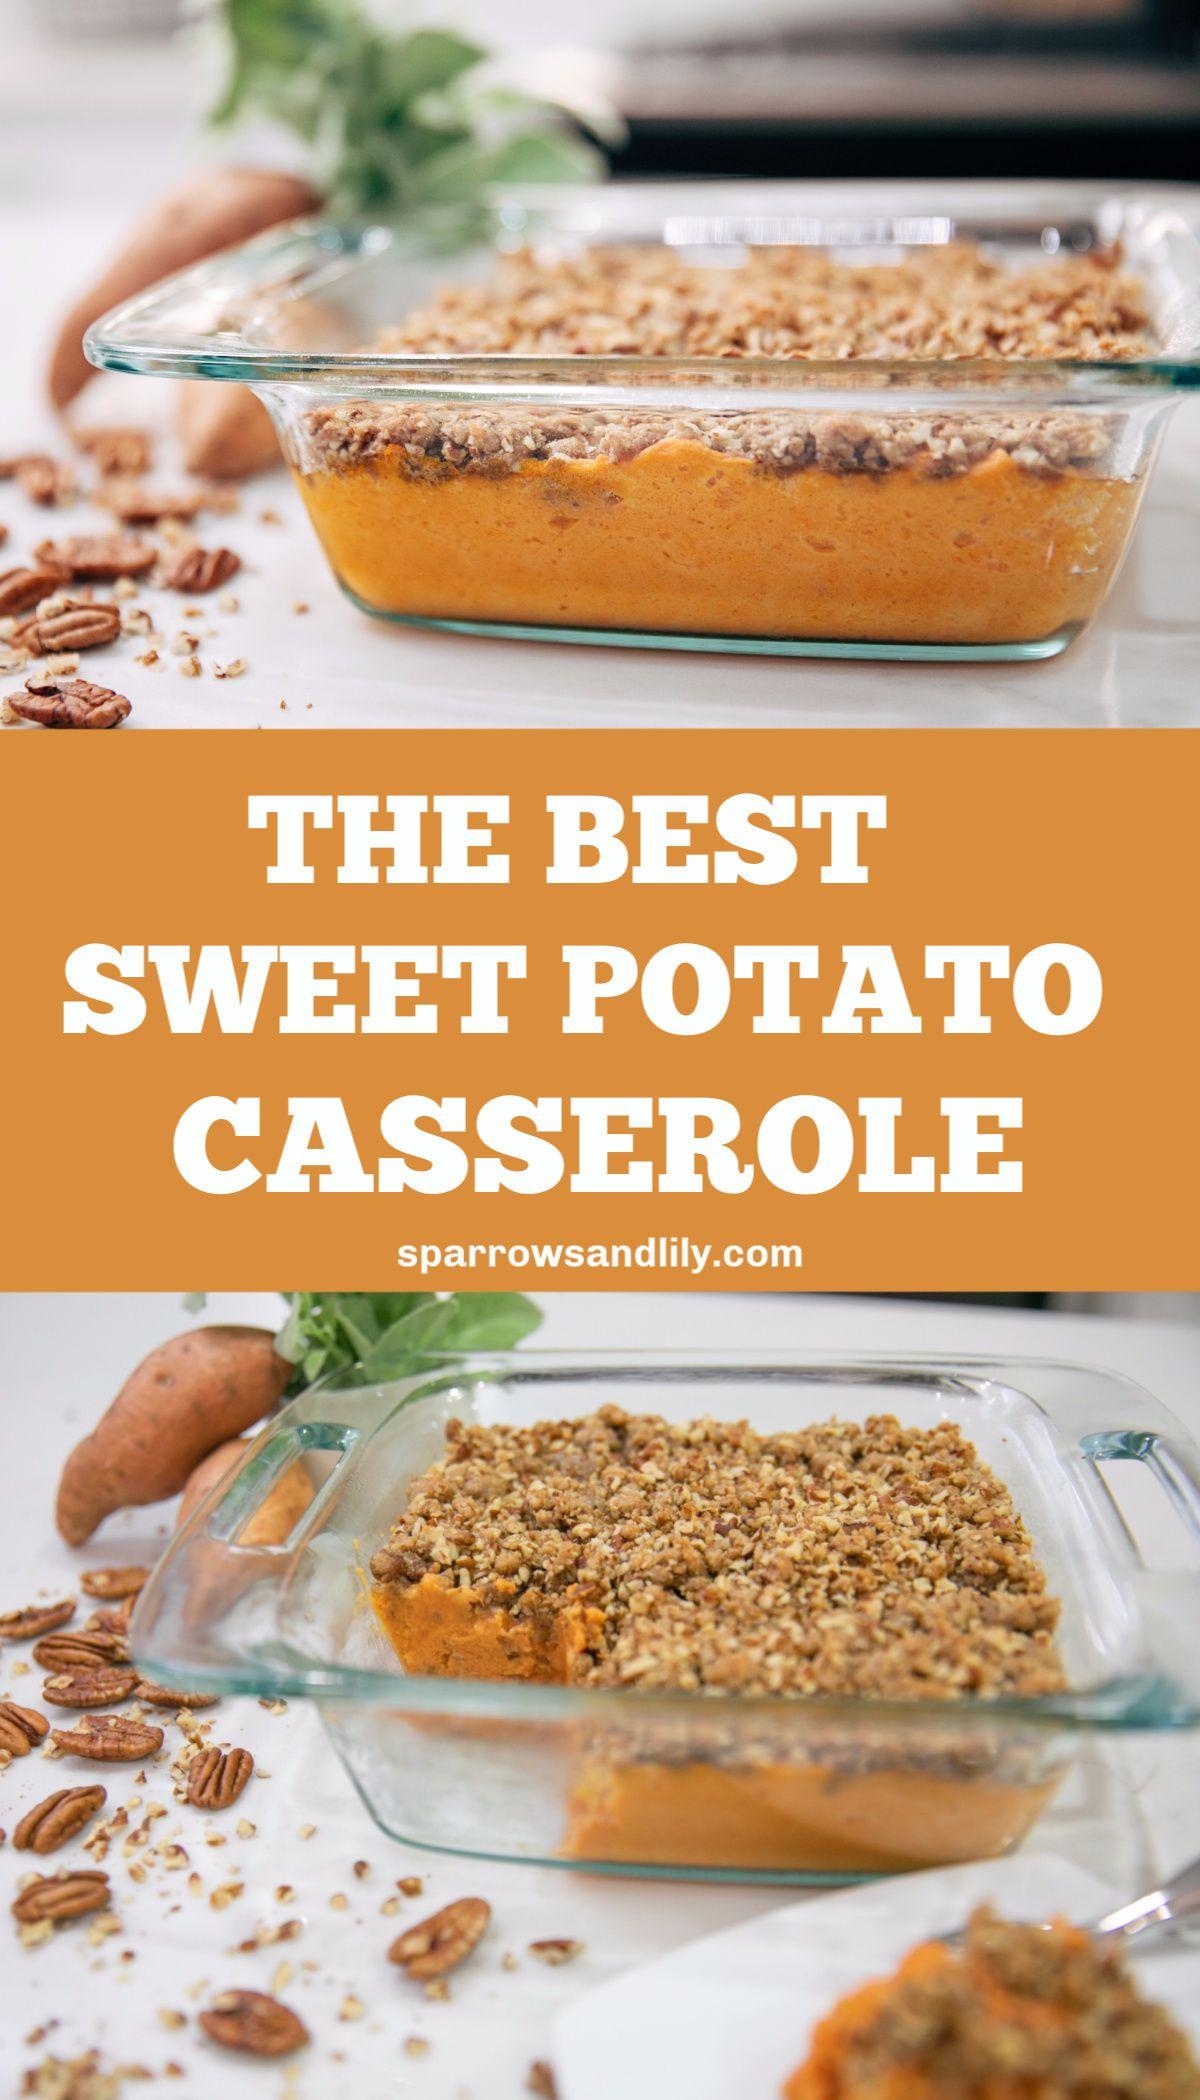 The BEST Sweet Potato Casserole Recipe